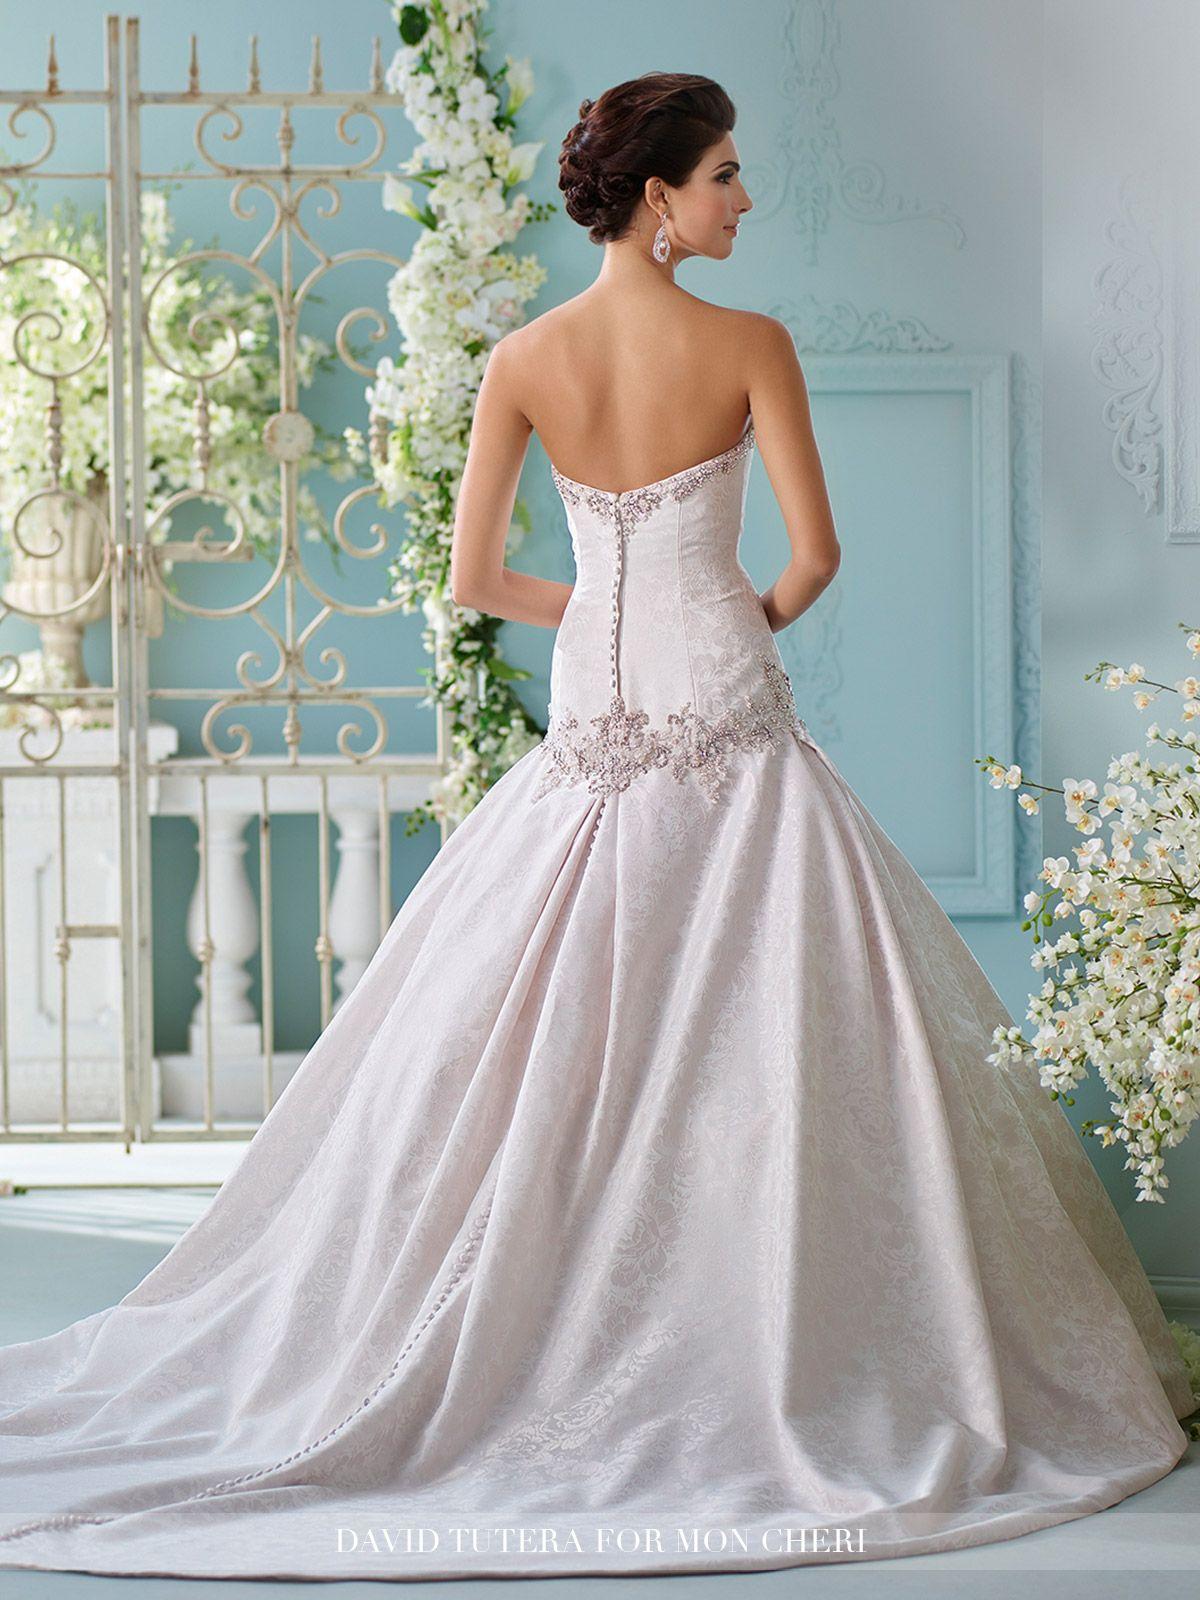 Unique Wedding Dresses Fall 2018 - Martin Thornburg | David tutera ...